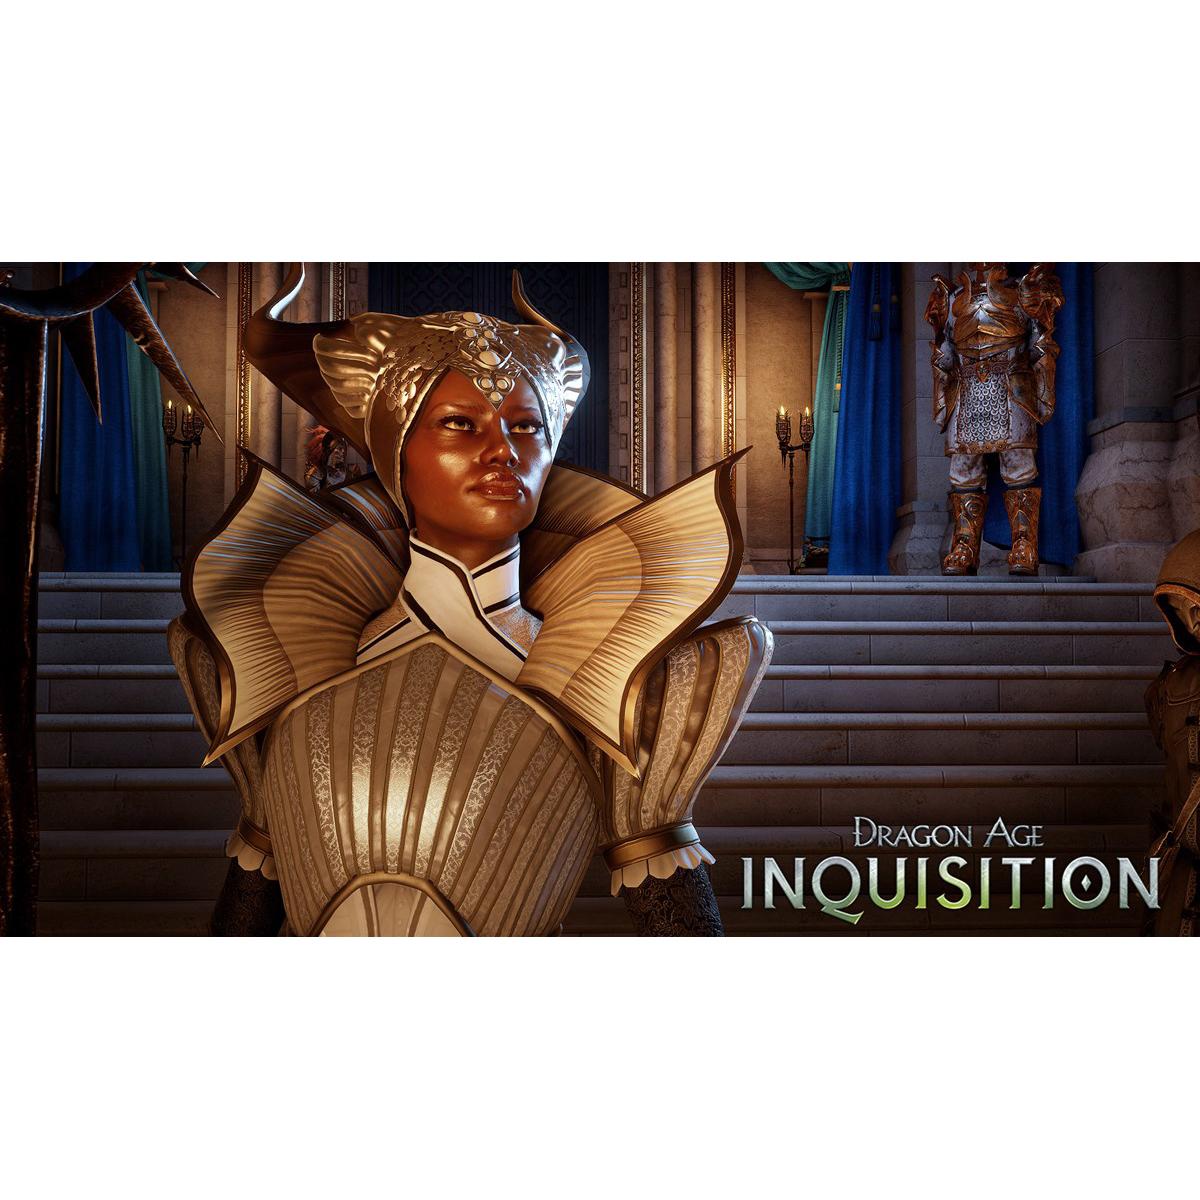 Joc Dragon Age: Inquisition pentru PlayStation 3 19